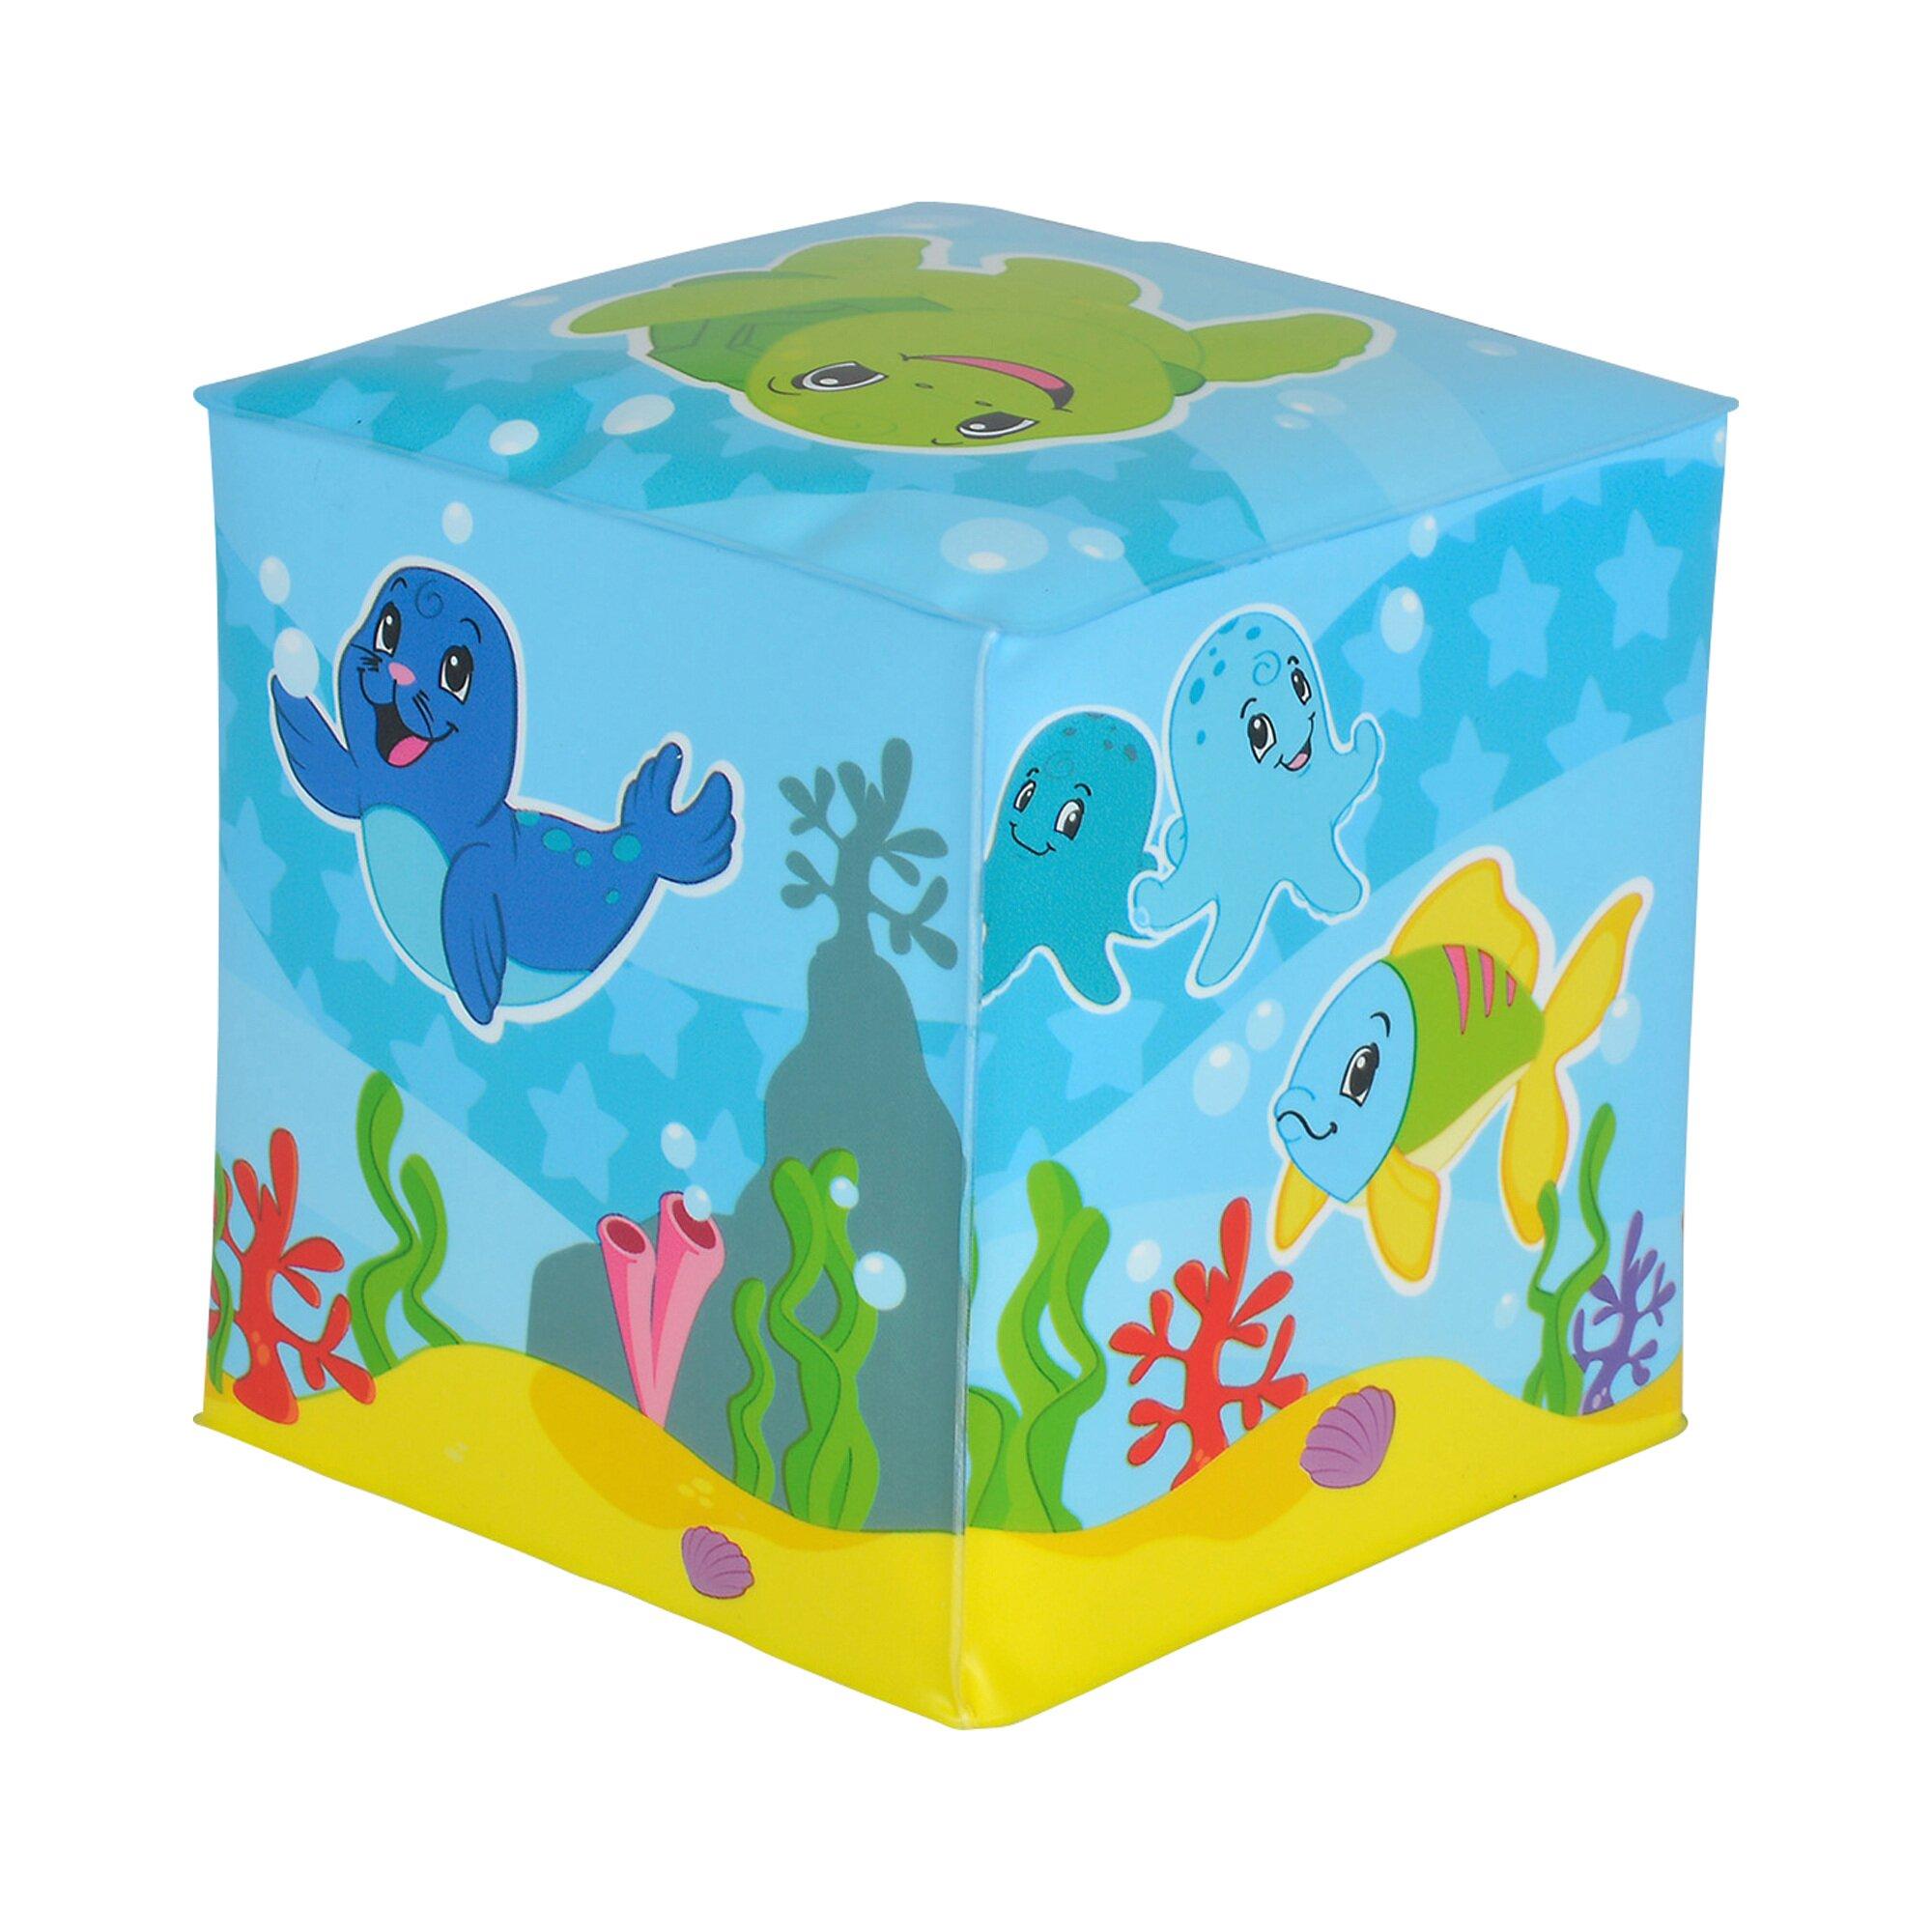 simba-badespielzeug-abc-badewurfel